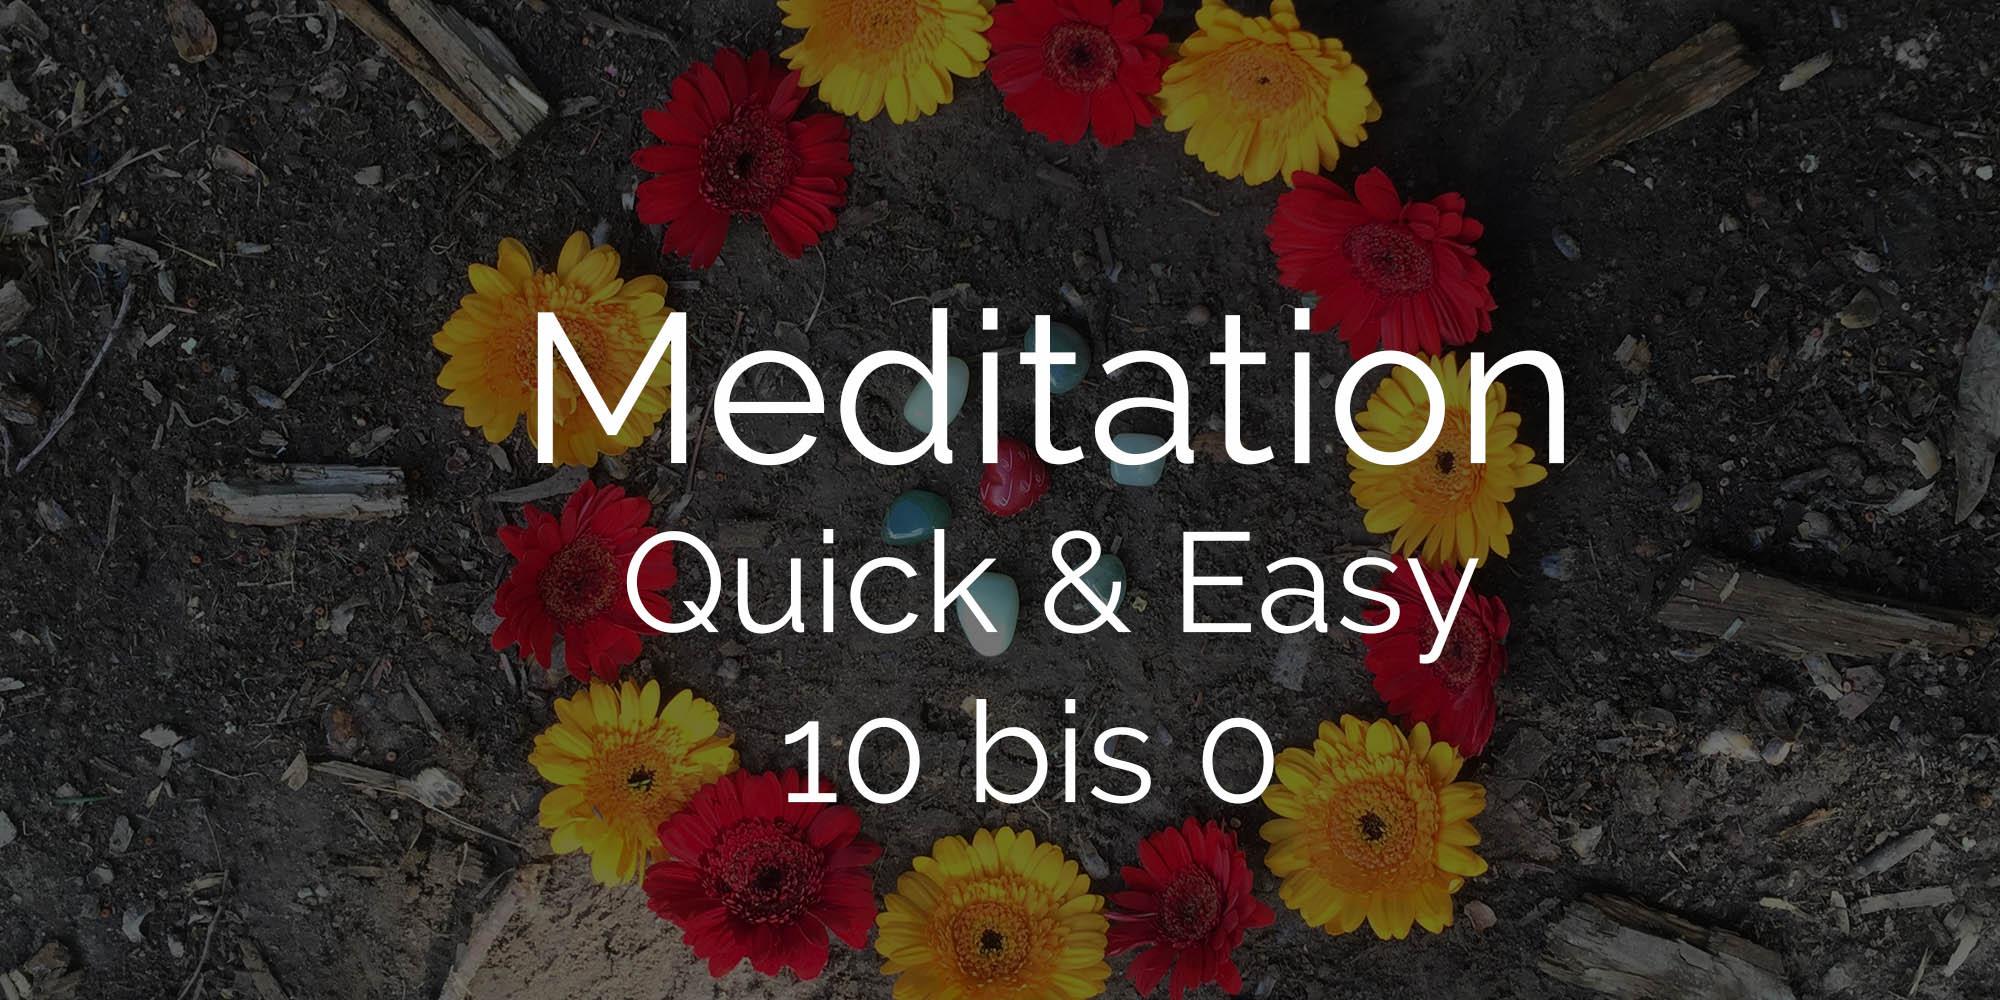 Blumen kranz rot gelb Meditation